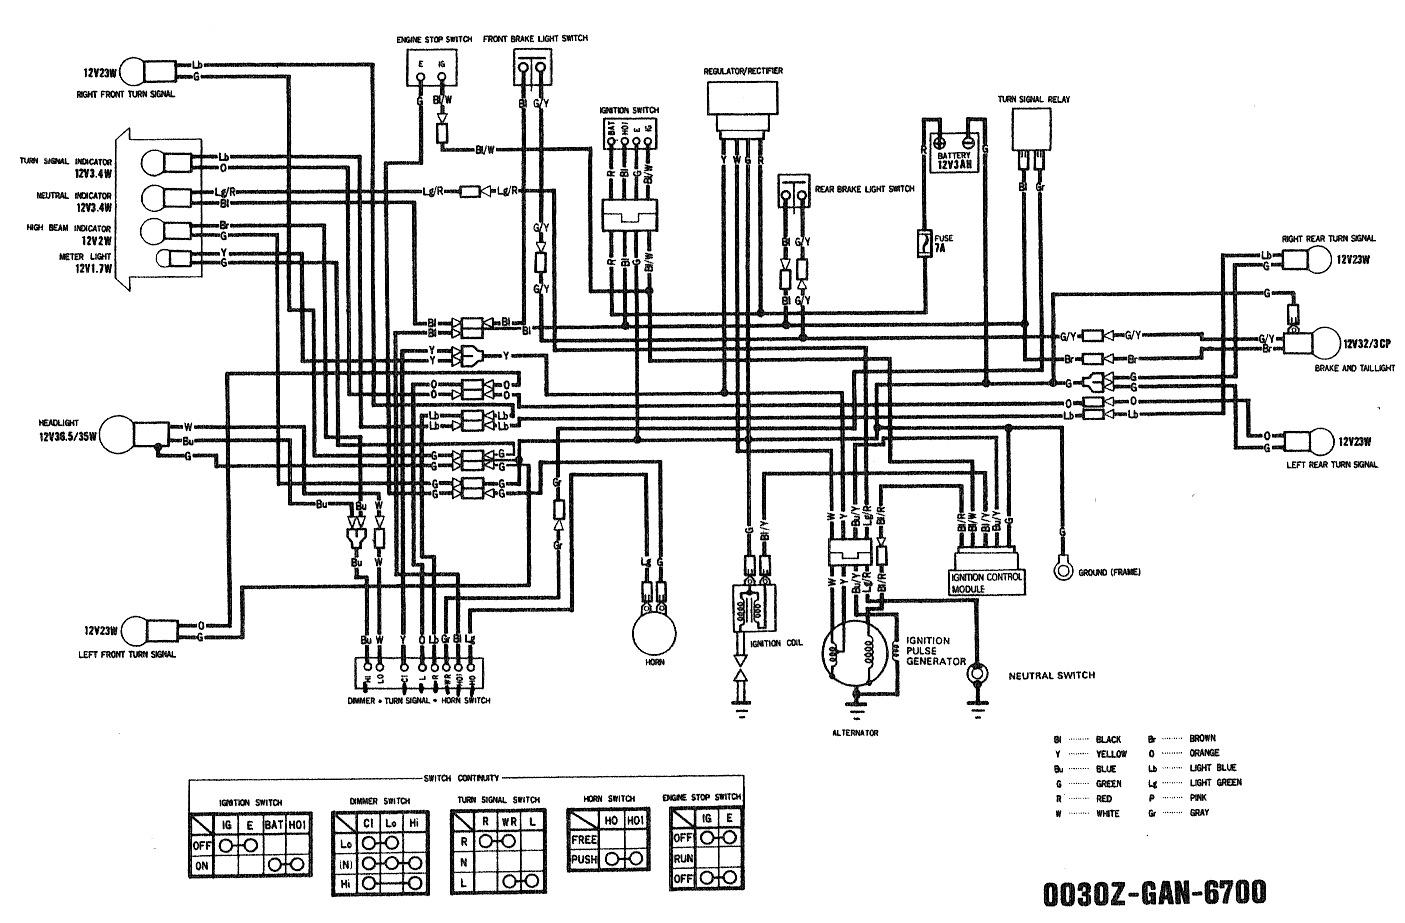 honda cb360 wiring diagram honda wiring diagram images rh magicalillusions org 3-Way Switch Wiring Diagram 139qmb wiring diagram